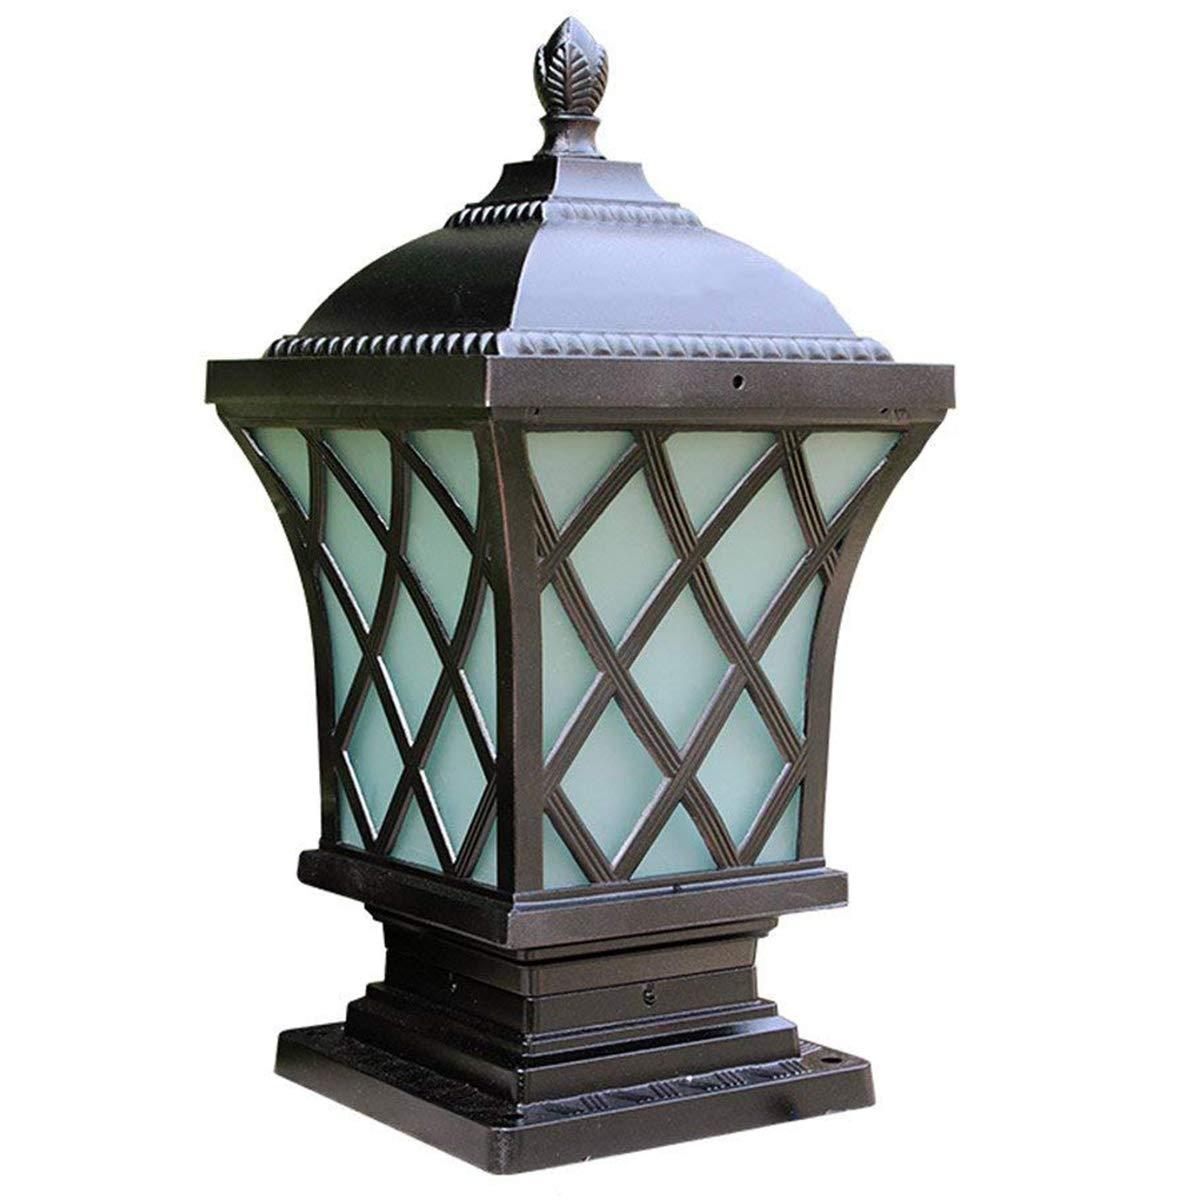 AFFC Mercato l'elegante Extra Large Solar cap luci o pilastro Solare, luci solari Illuminazione Esterna Paesaggio Illuminazione Giardino LED Luce Solare Post